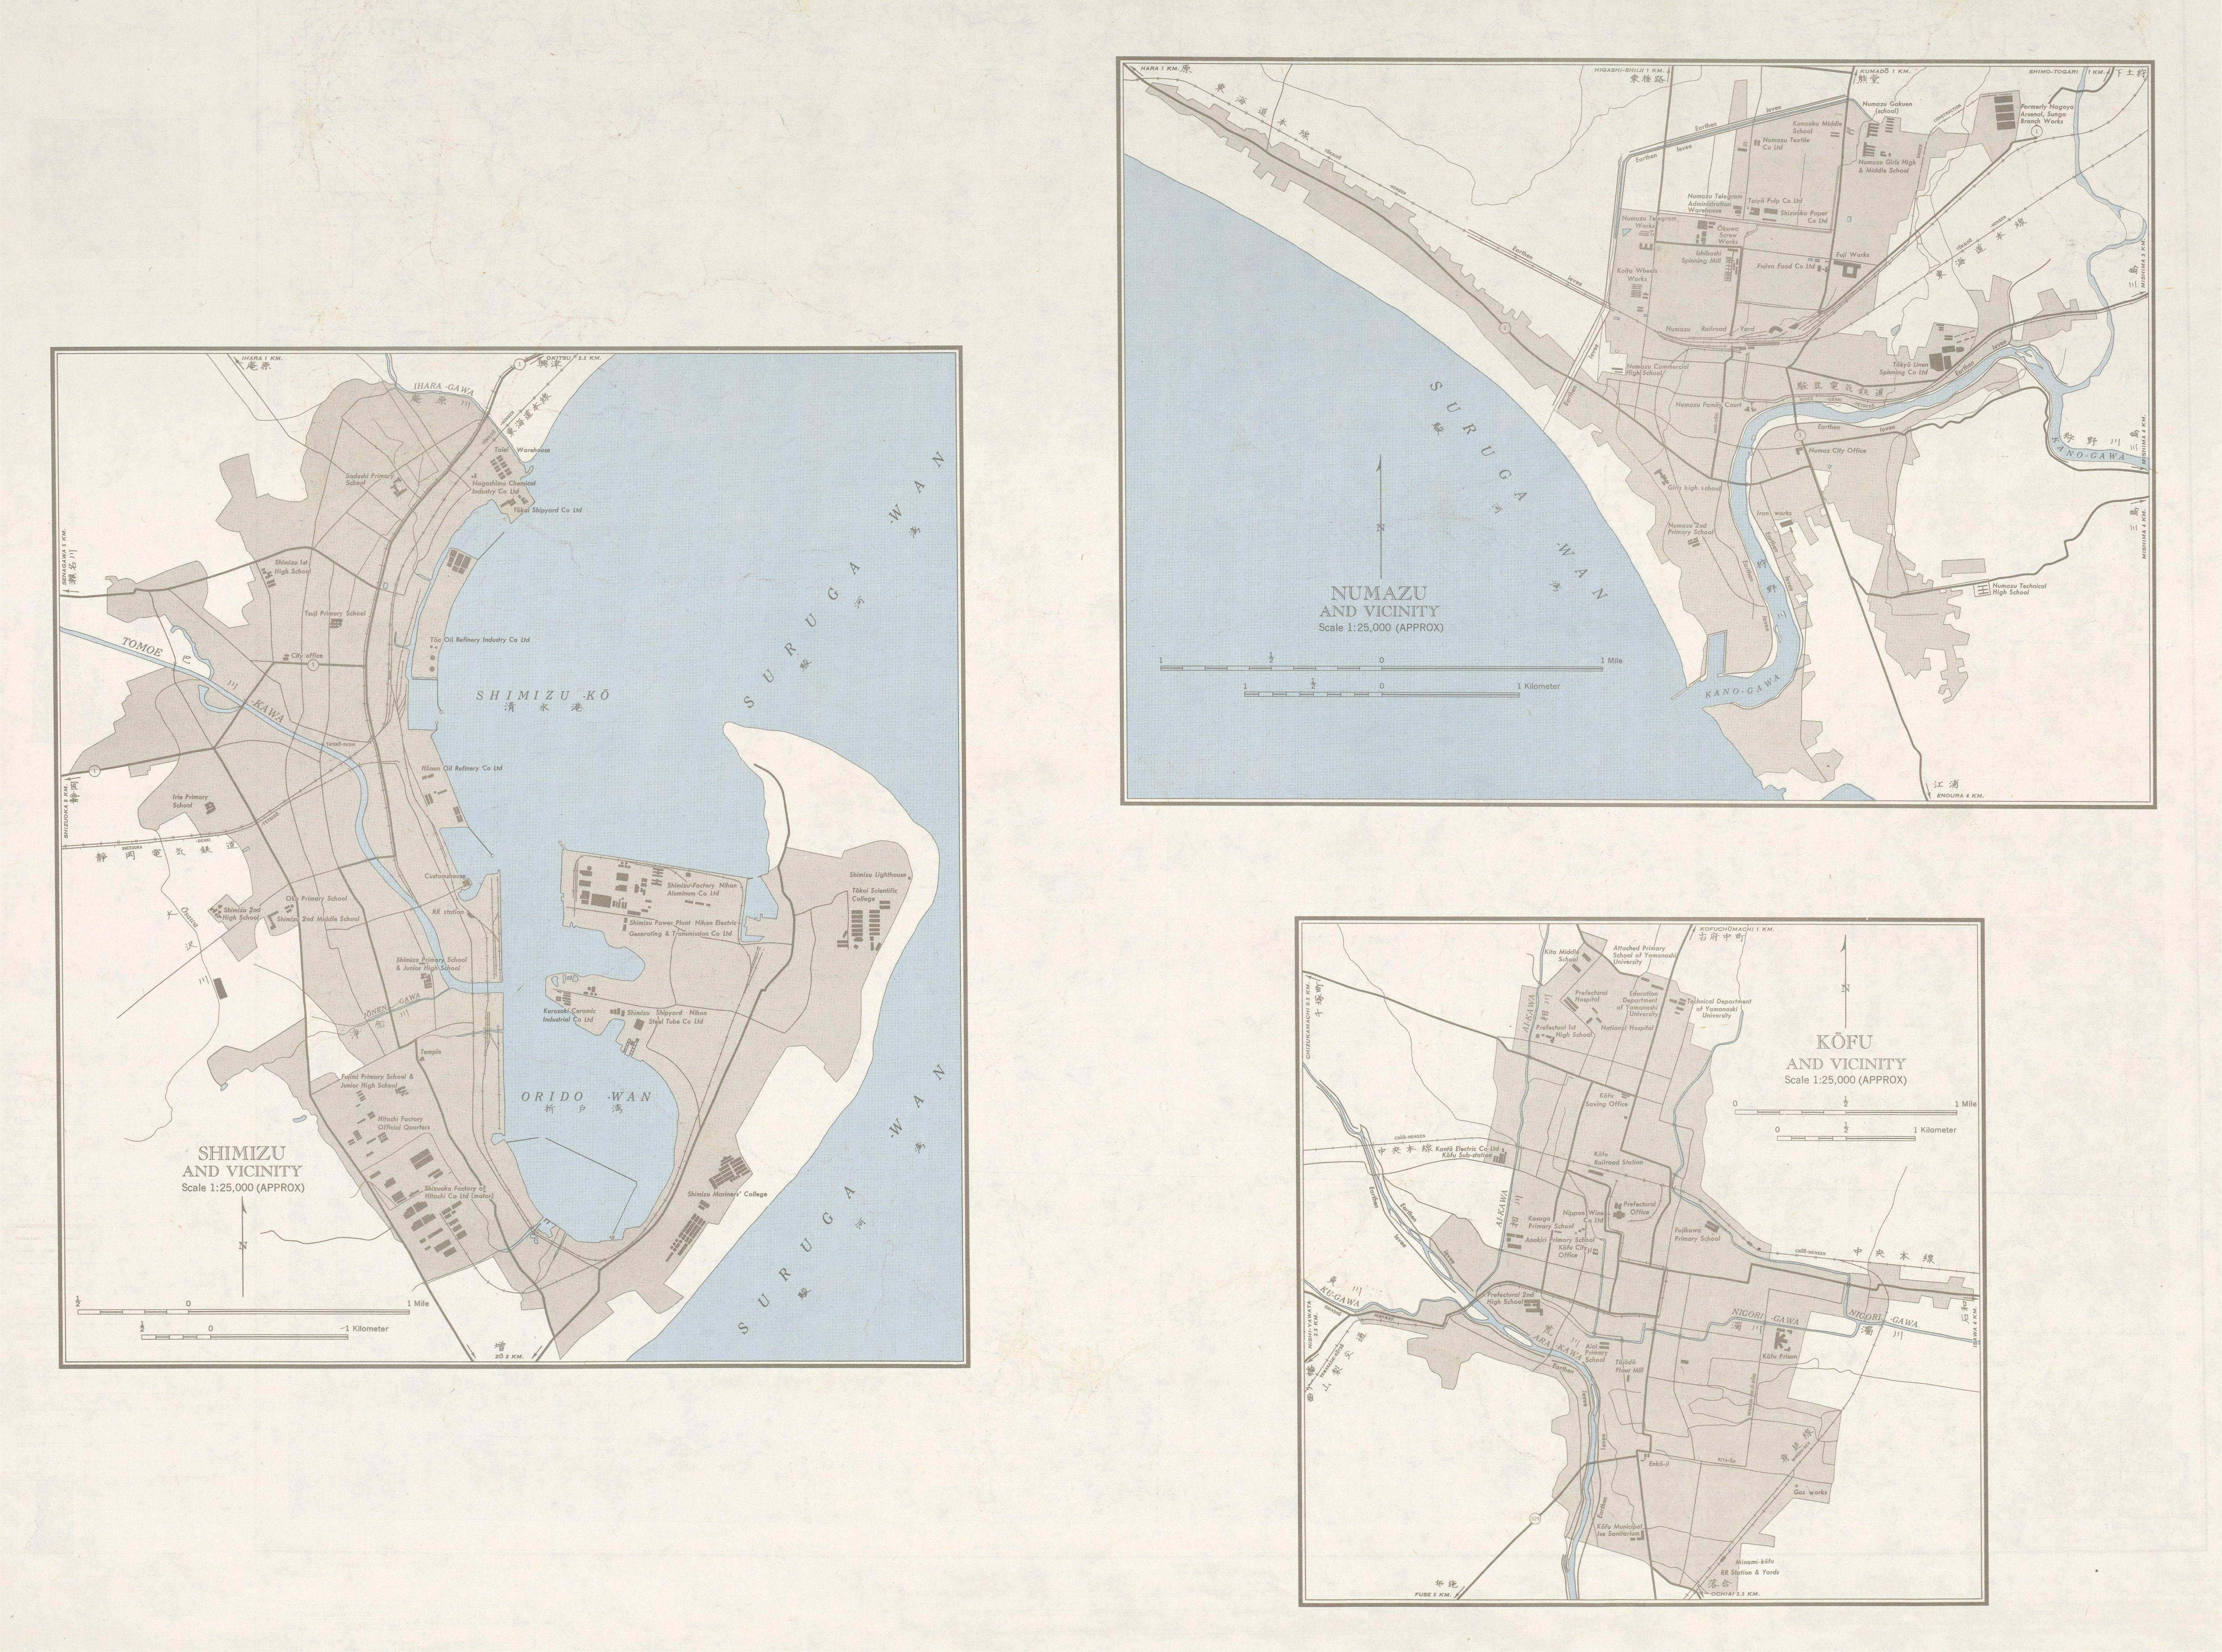 Mapas de Shimizu, Numazu, Kofu y sus Cercanias, Japón 1954